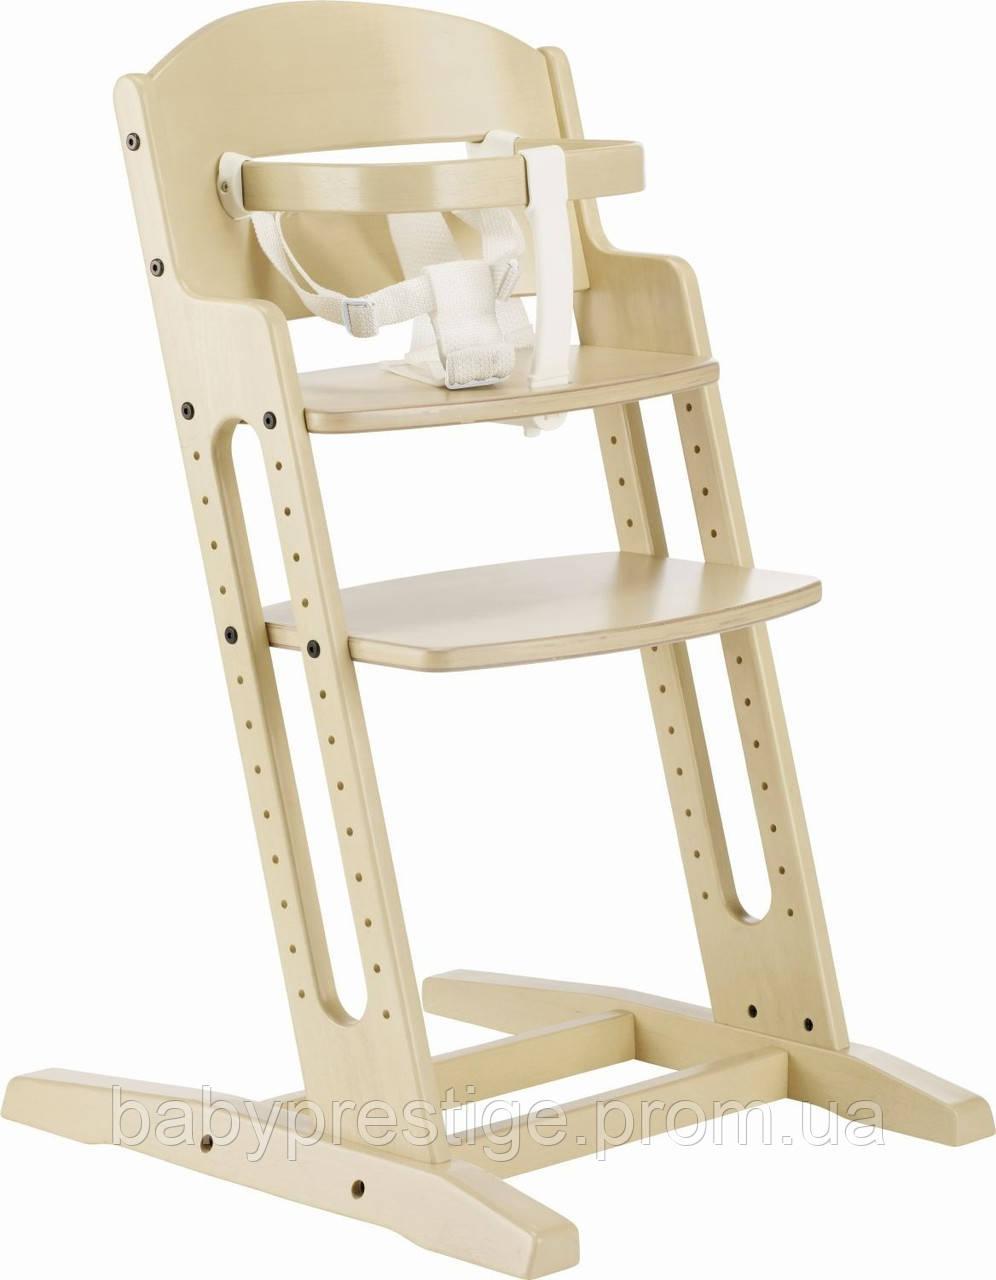 Стульчик для кормления Baby DanChair White wash., фото 1